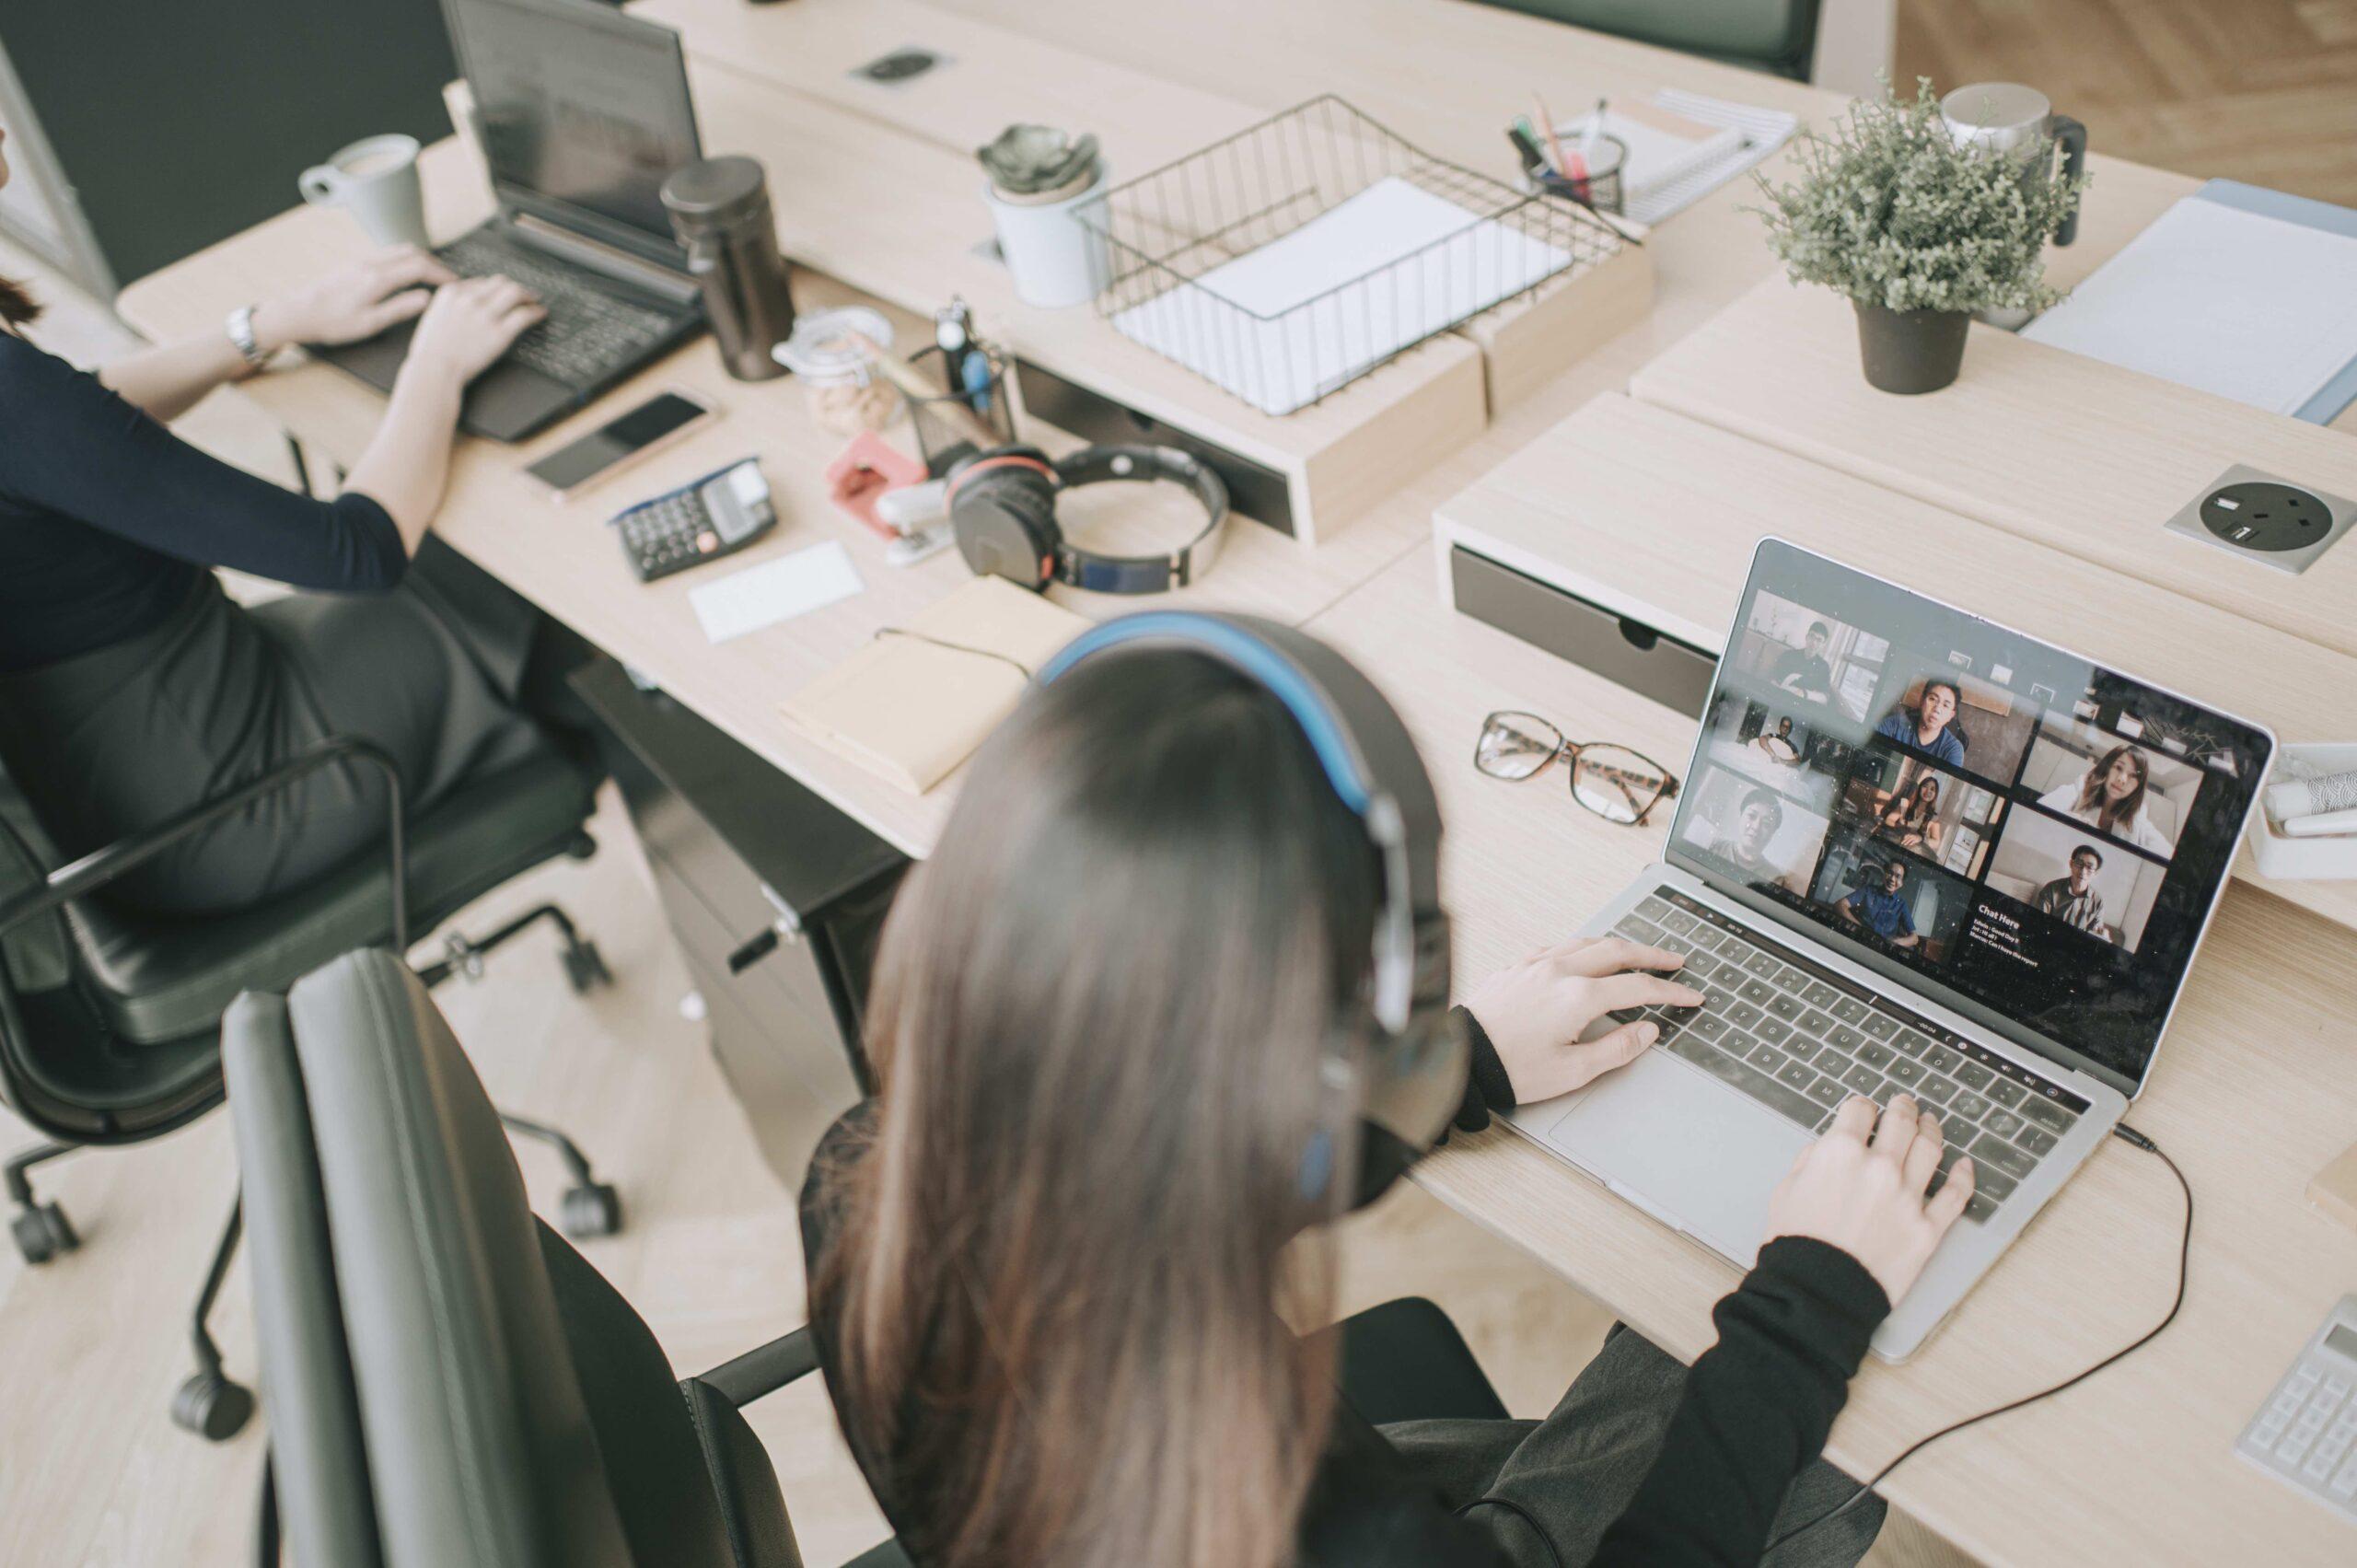 Team working in open office